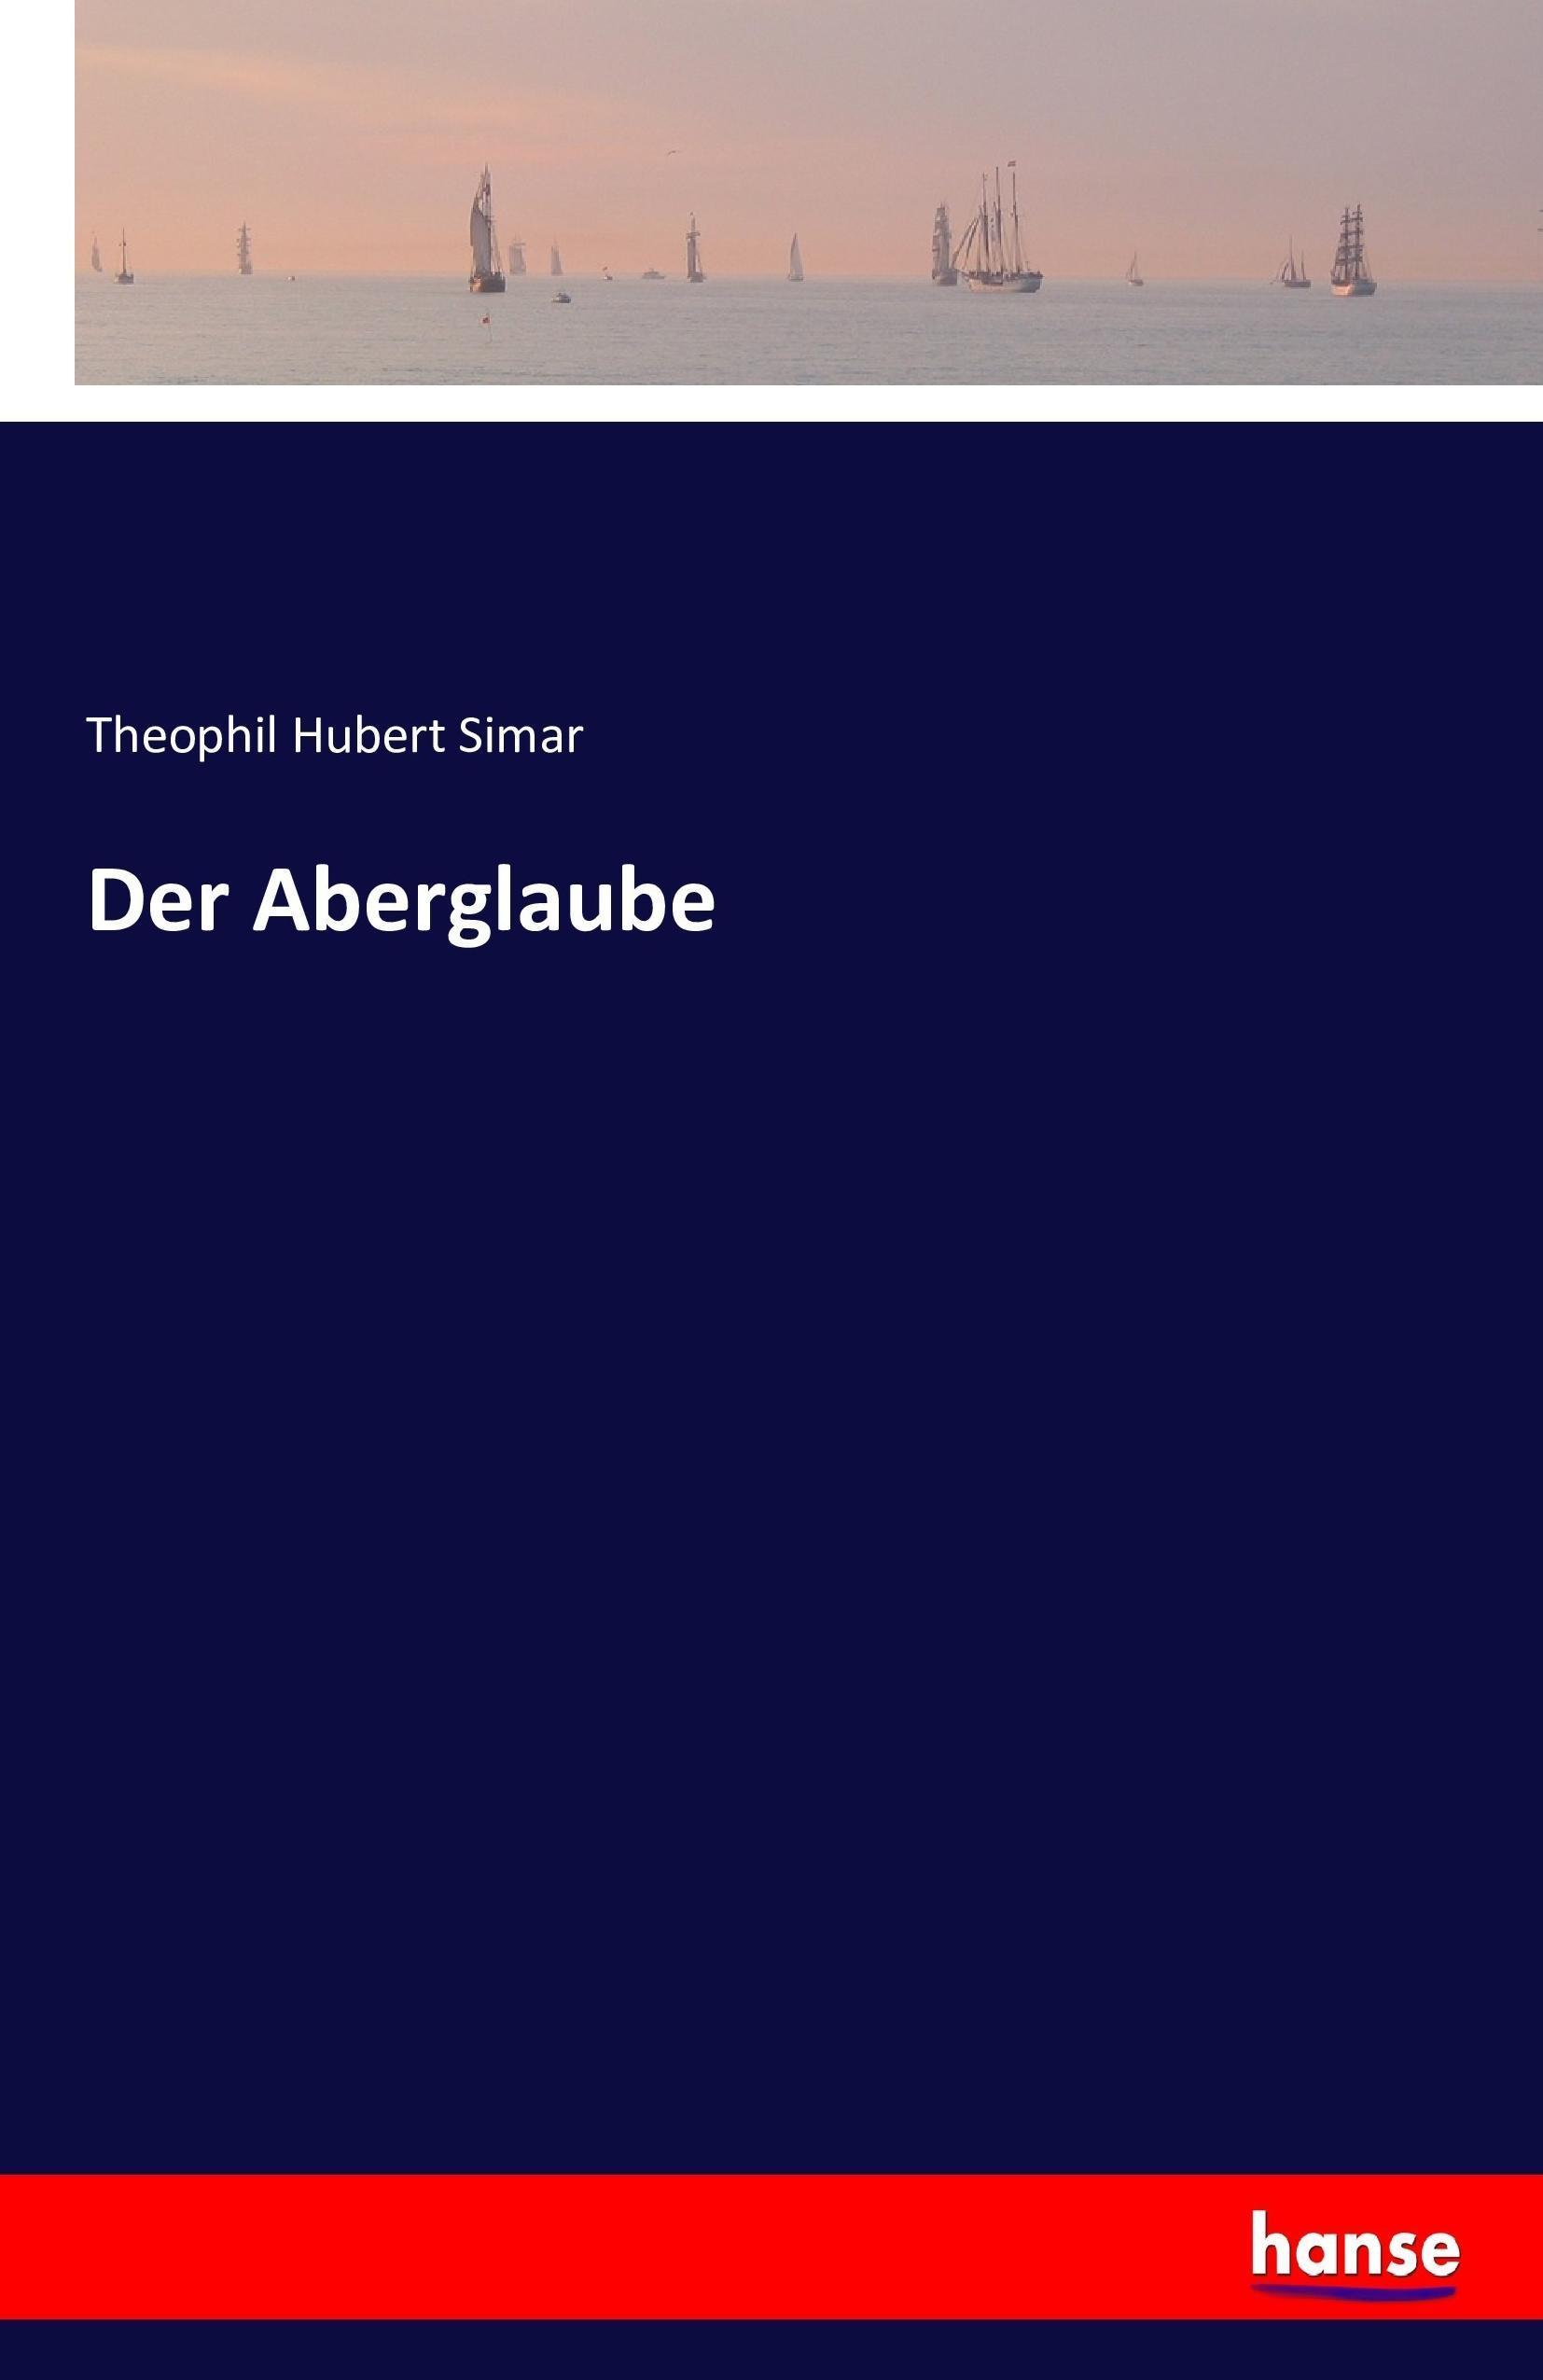 Der Aberglaube   Theophil Hubert Simar    9783741173806